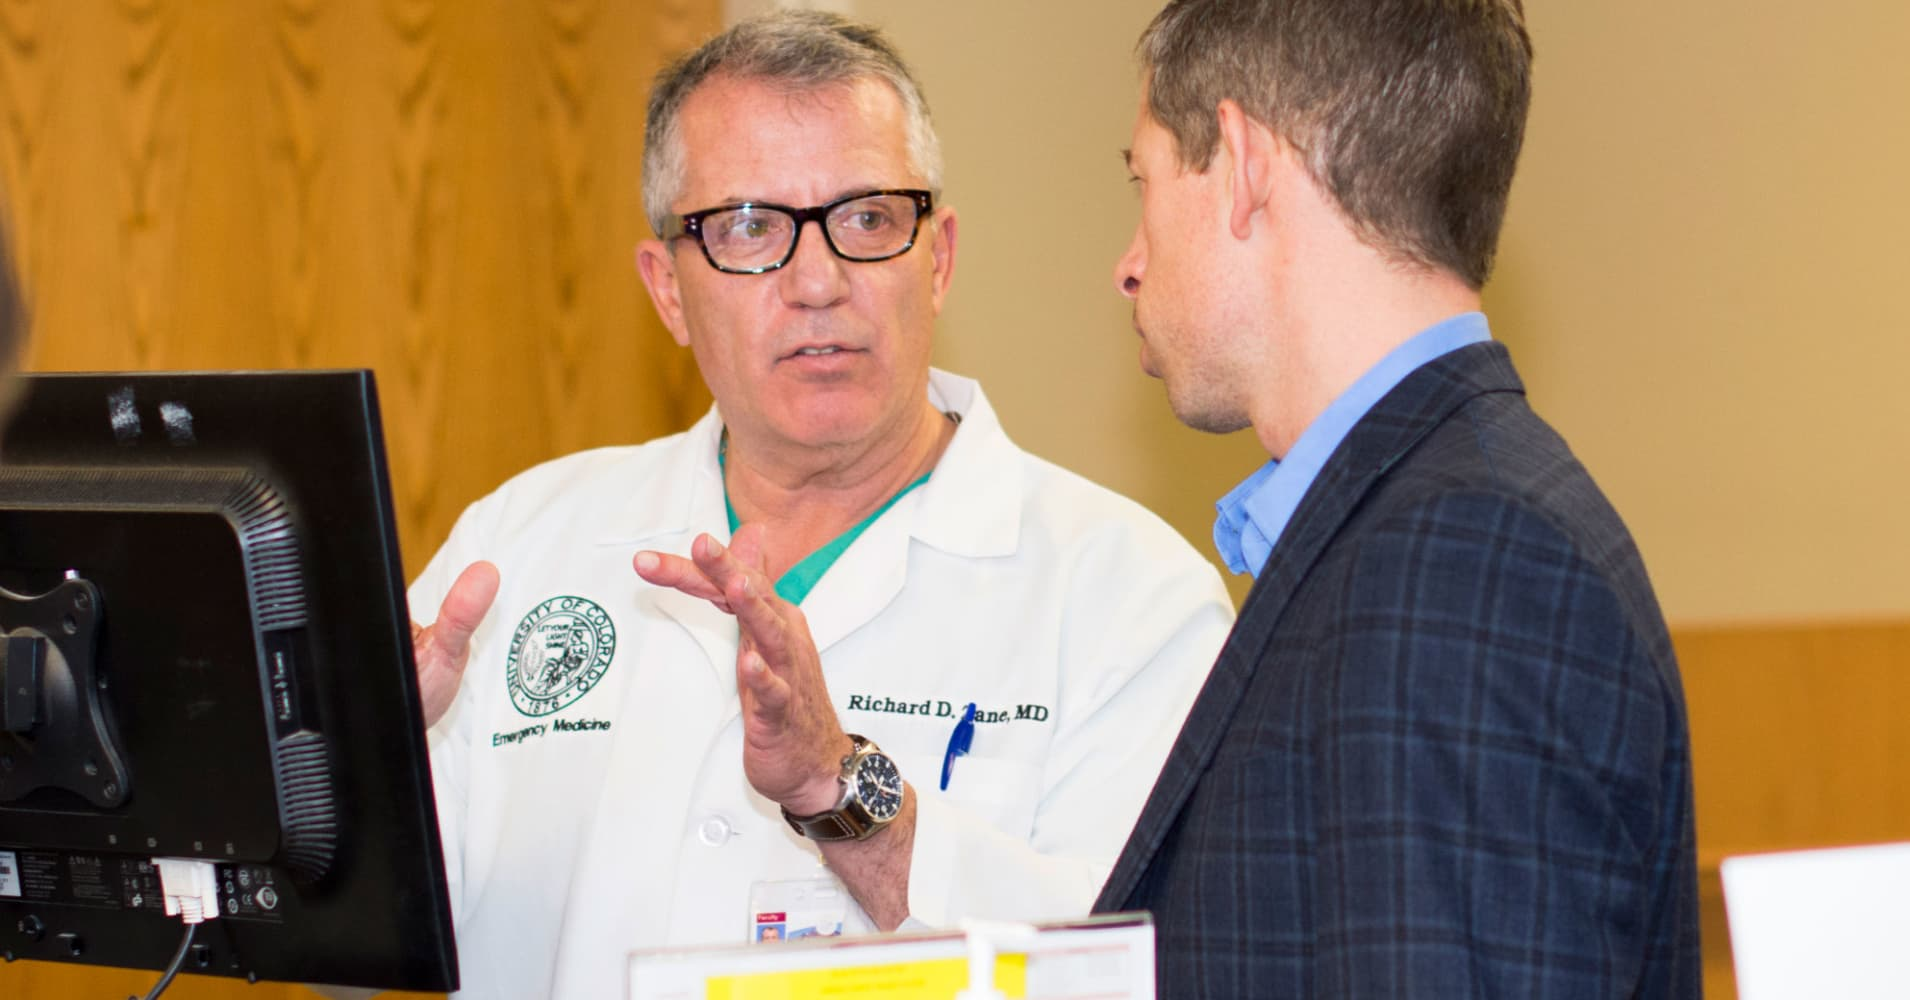 UC Health's chief innovation officer Richard Zane and local entrepreneur Carm Huntress.